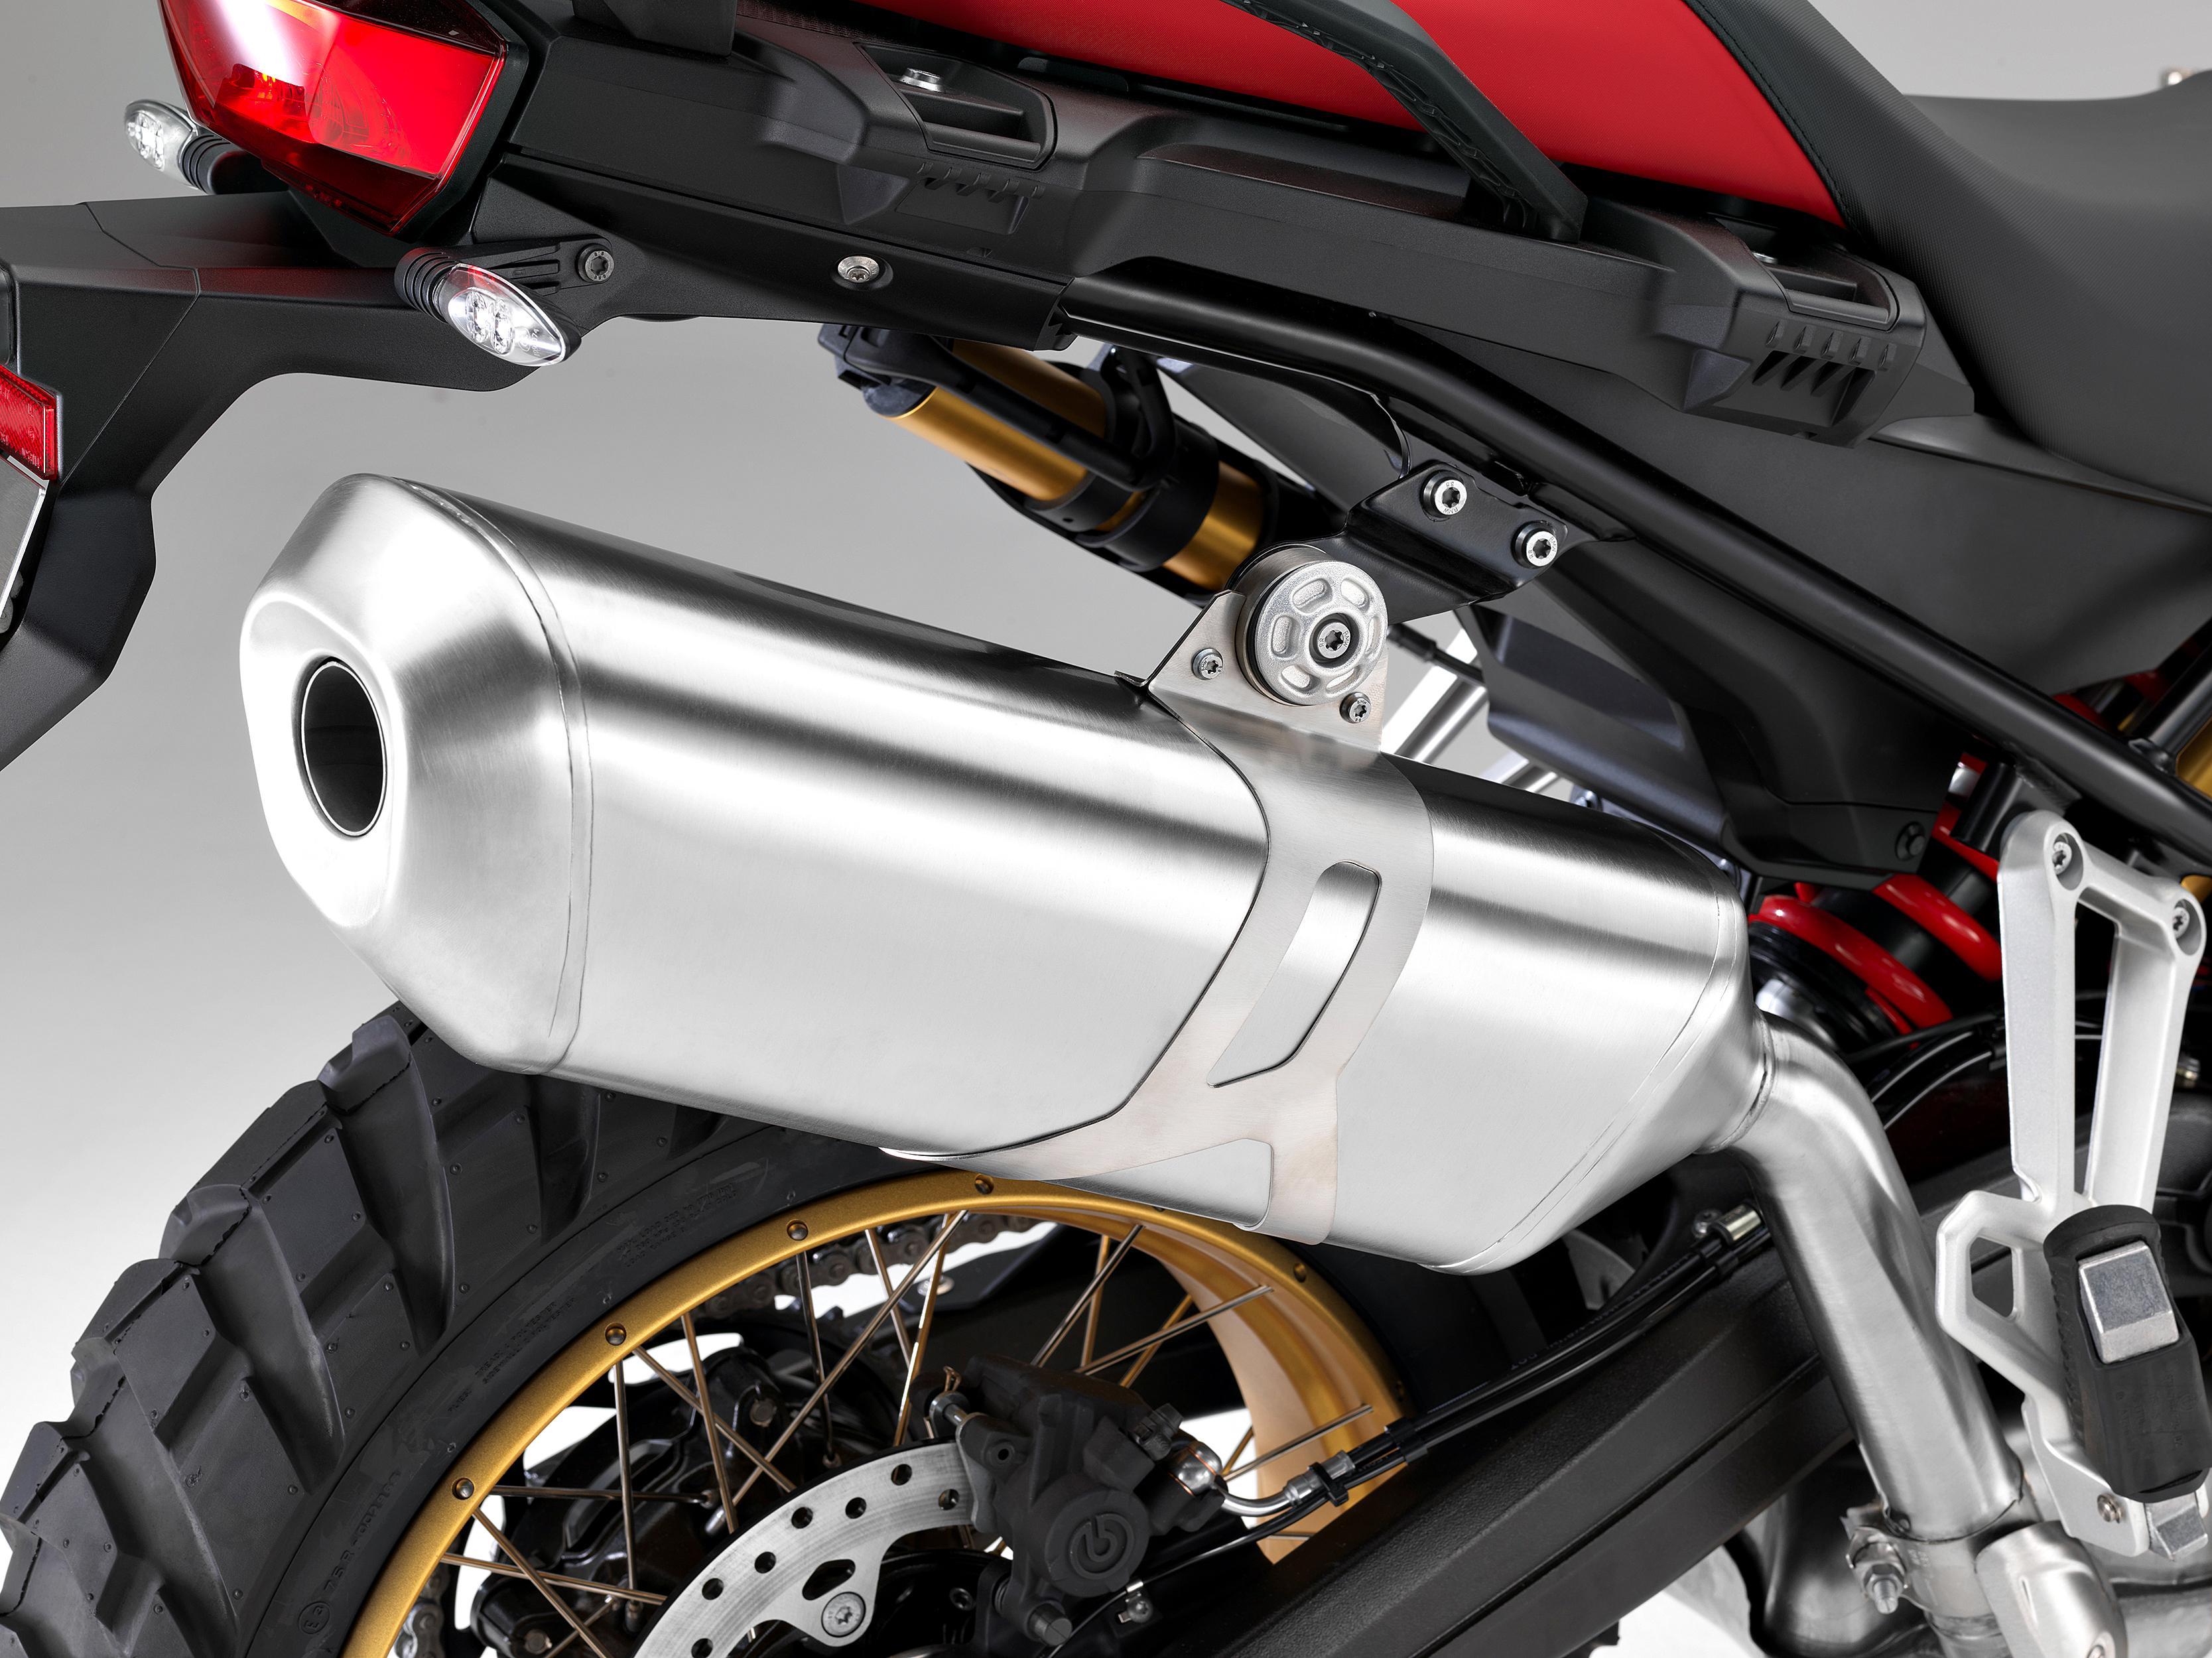 Prueba BMW 850 GS 2018 presentación MotorADN fotos prensa (130)